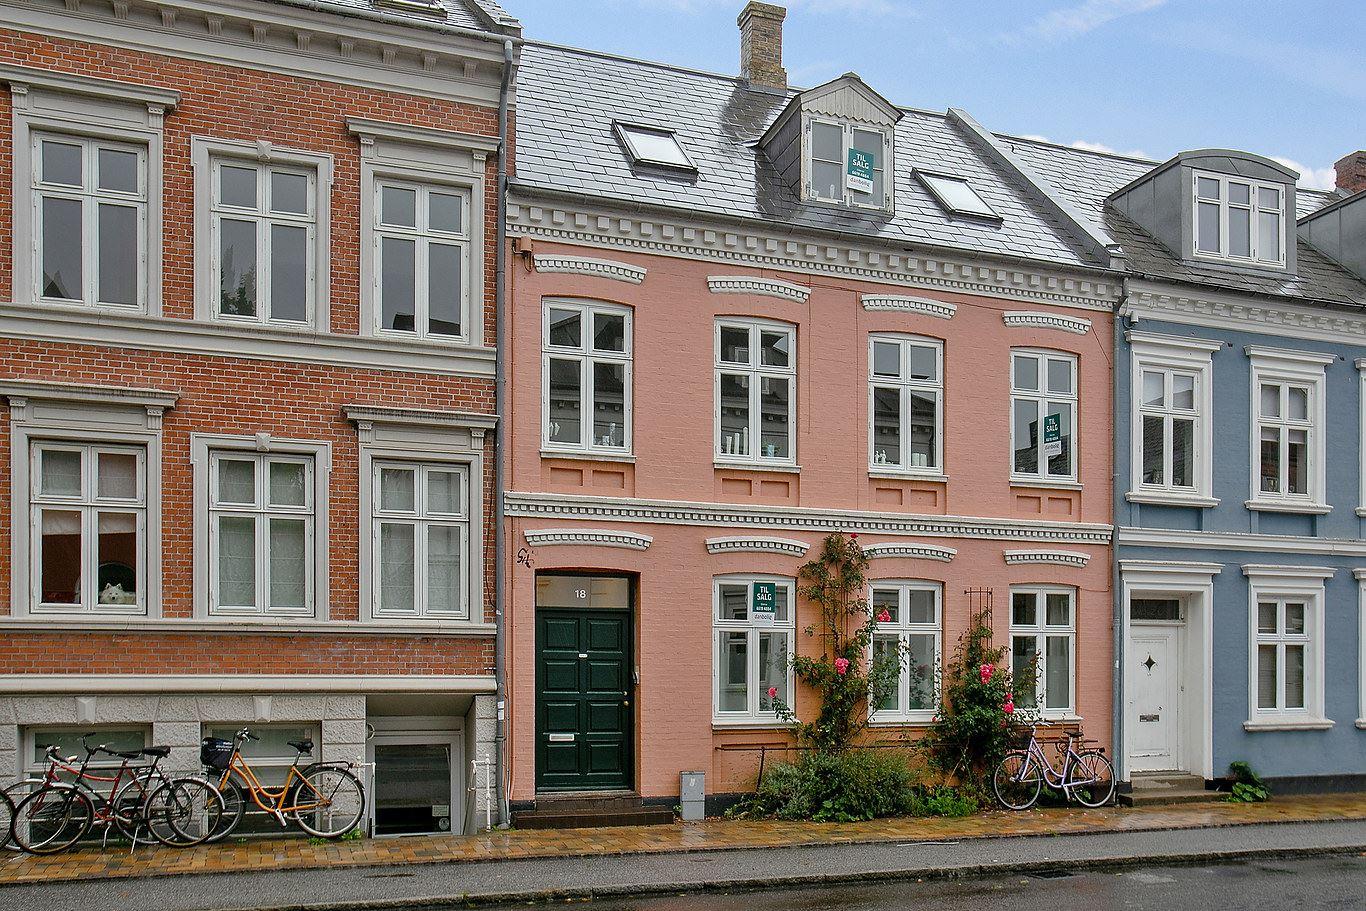 Absalonsgade 18, 5000 Odense C